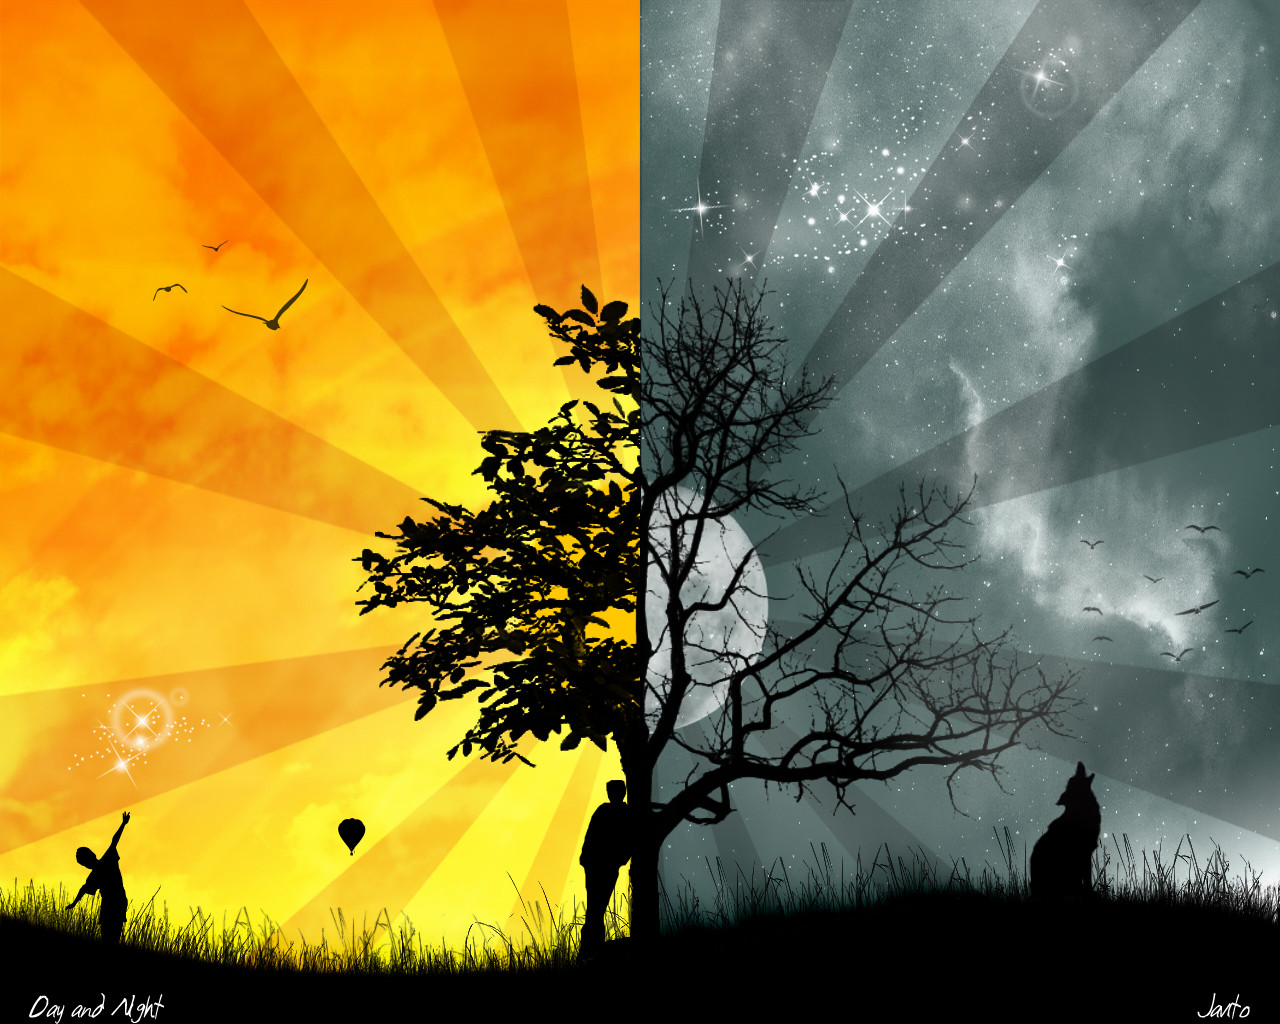 http://4.bp.blogspot.com/-zvVHePWvYws/TwHBMdiTPcI/AAAAAAAAAE4/8_TbynHwr8M/s1600/Cool-Wallpapers-.jpg